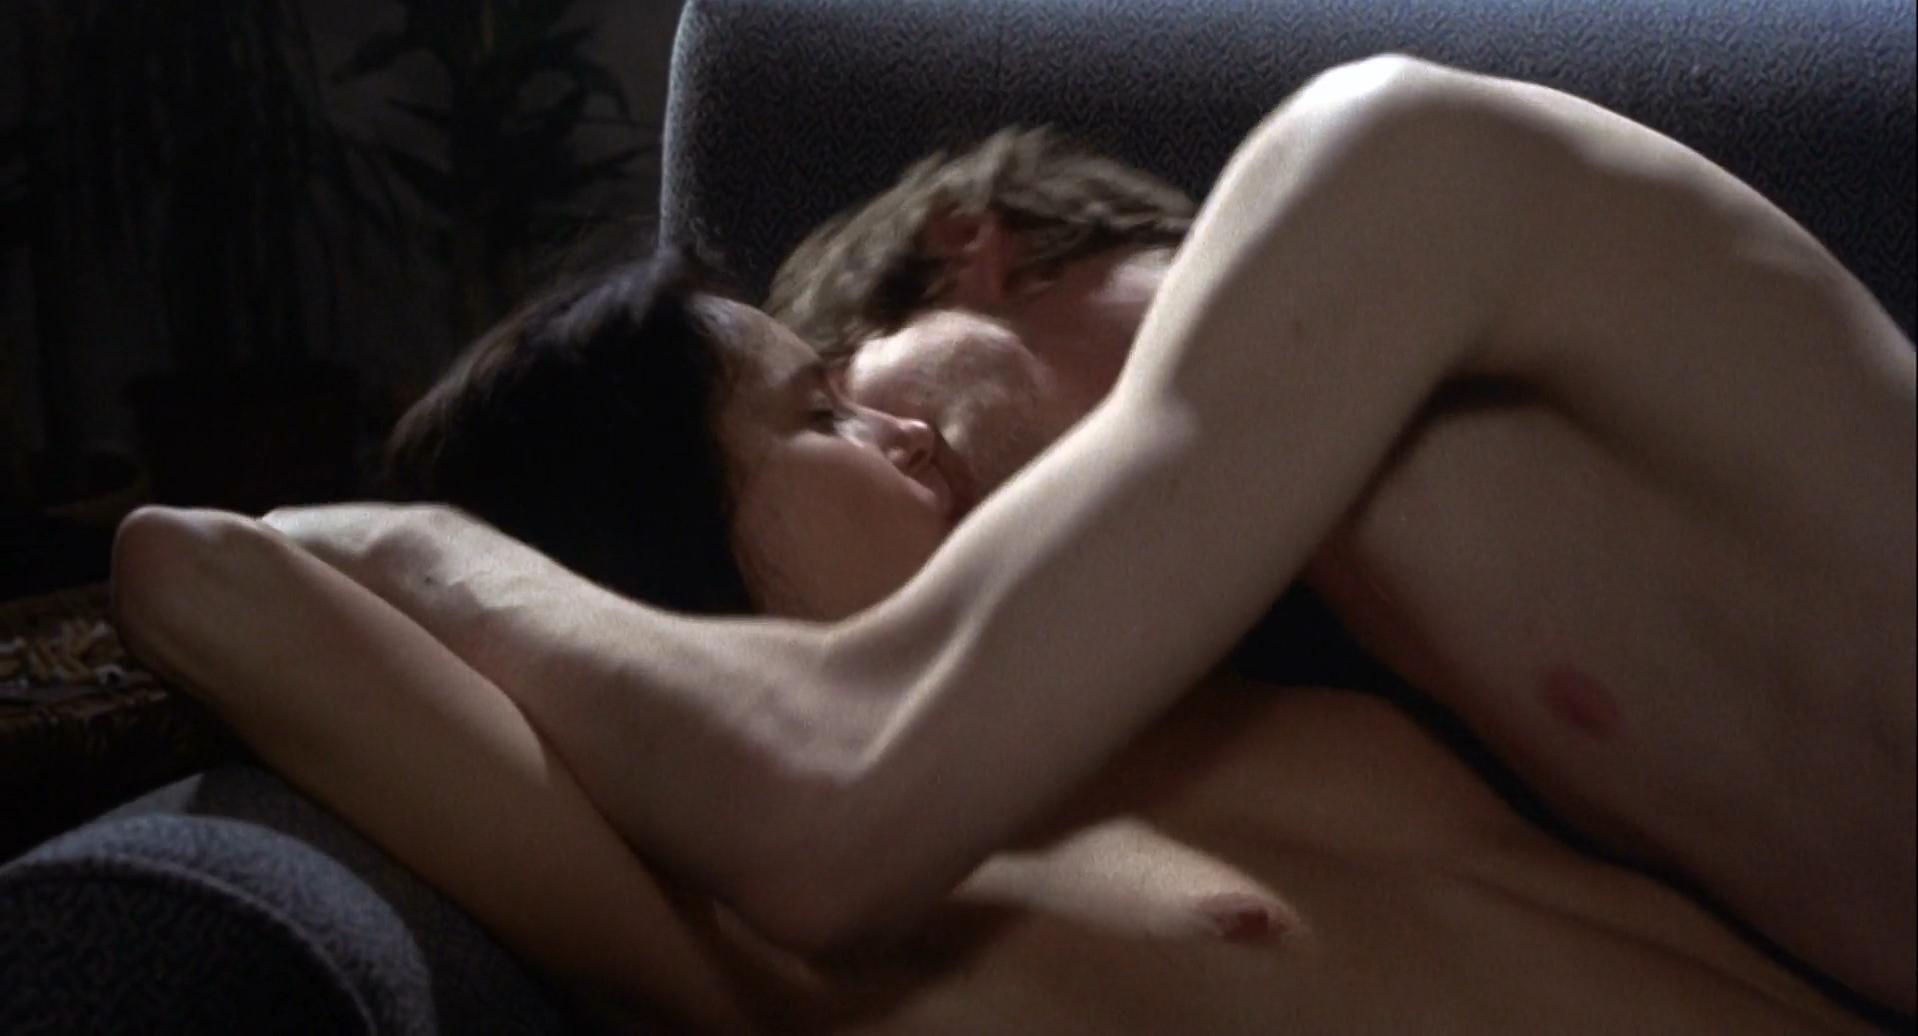 Katrin Cartlidge nude, Deborah MacLaren nude - Naked (1993)